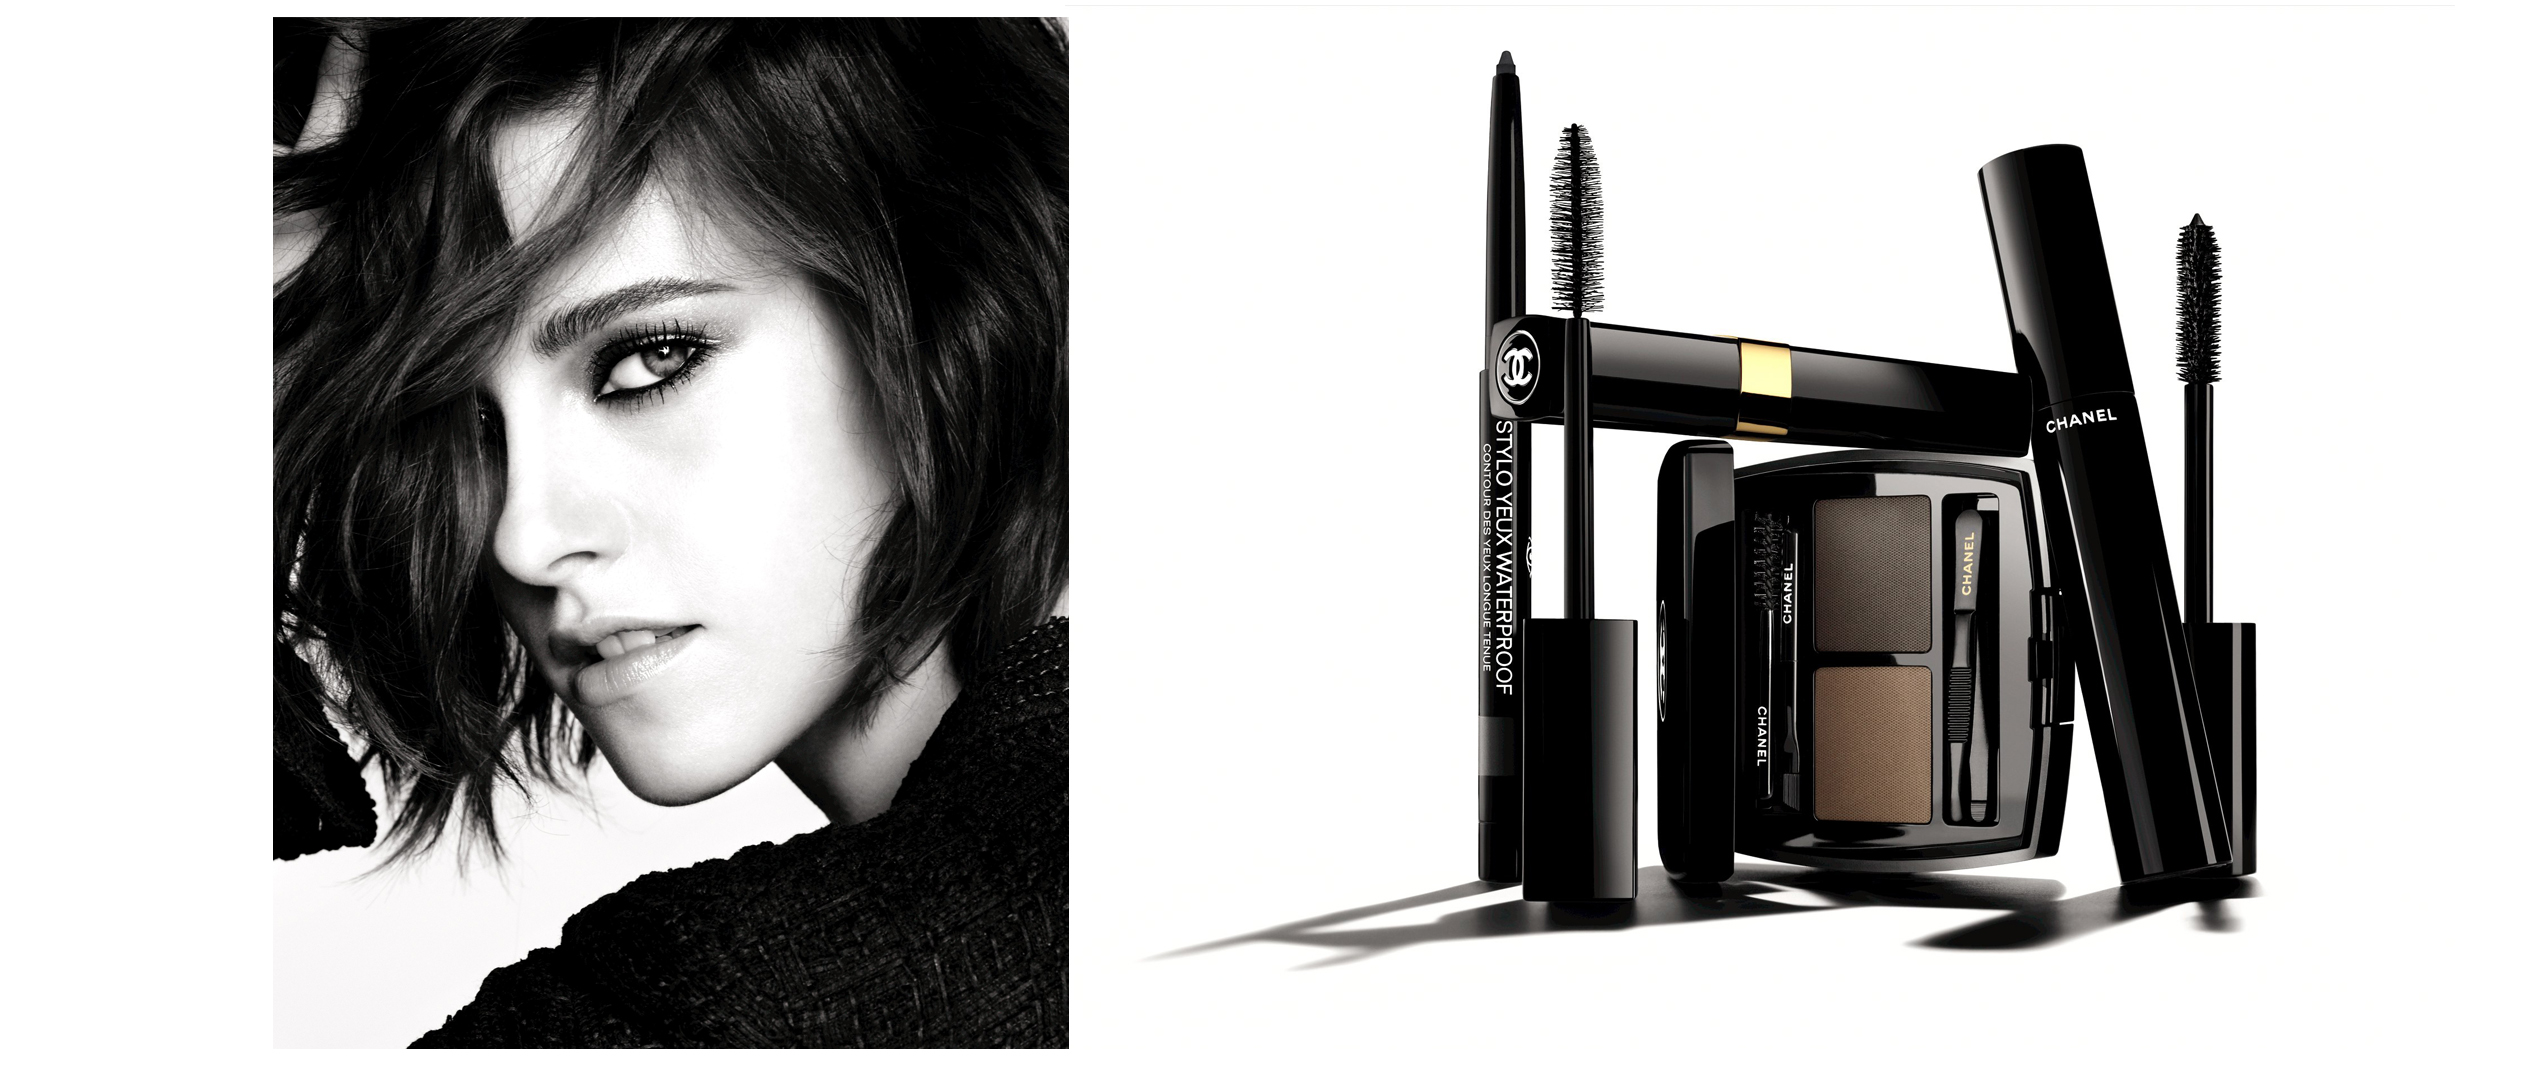 Chanel colección ojos 2016, Kristen Stewart